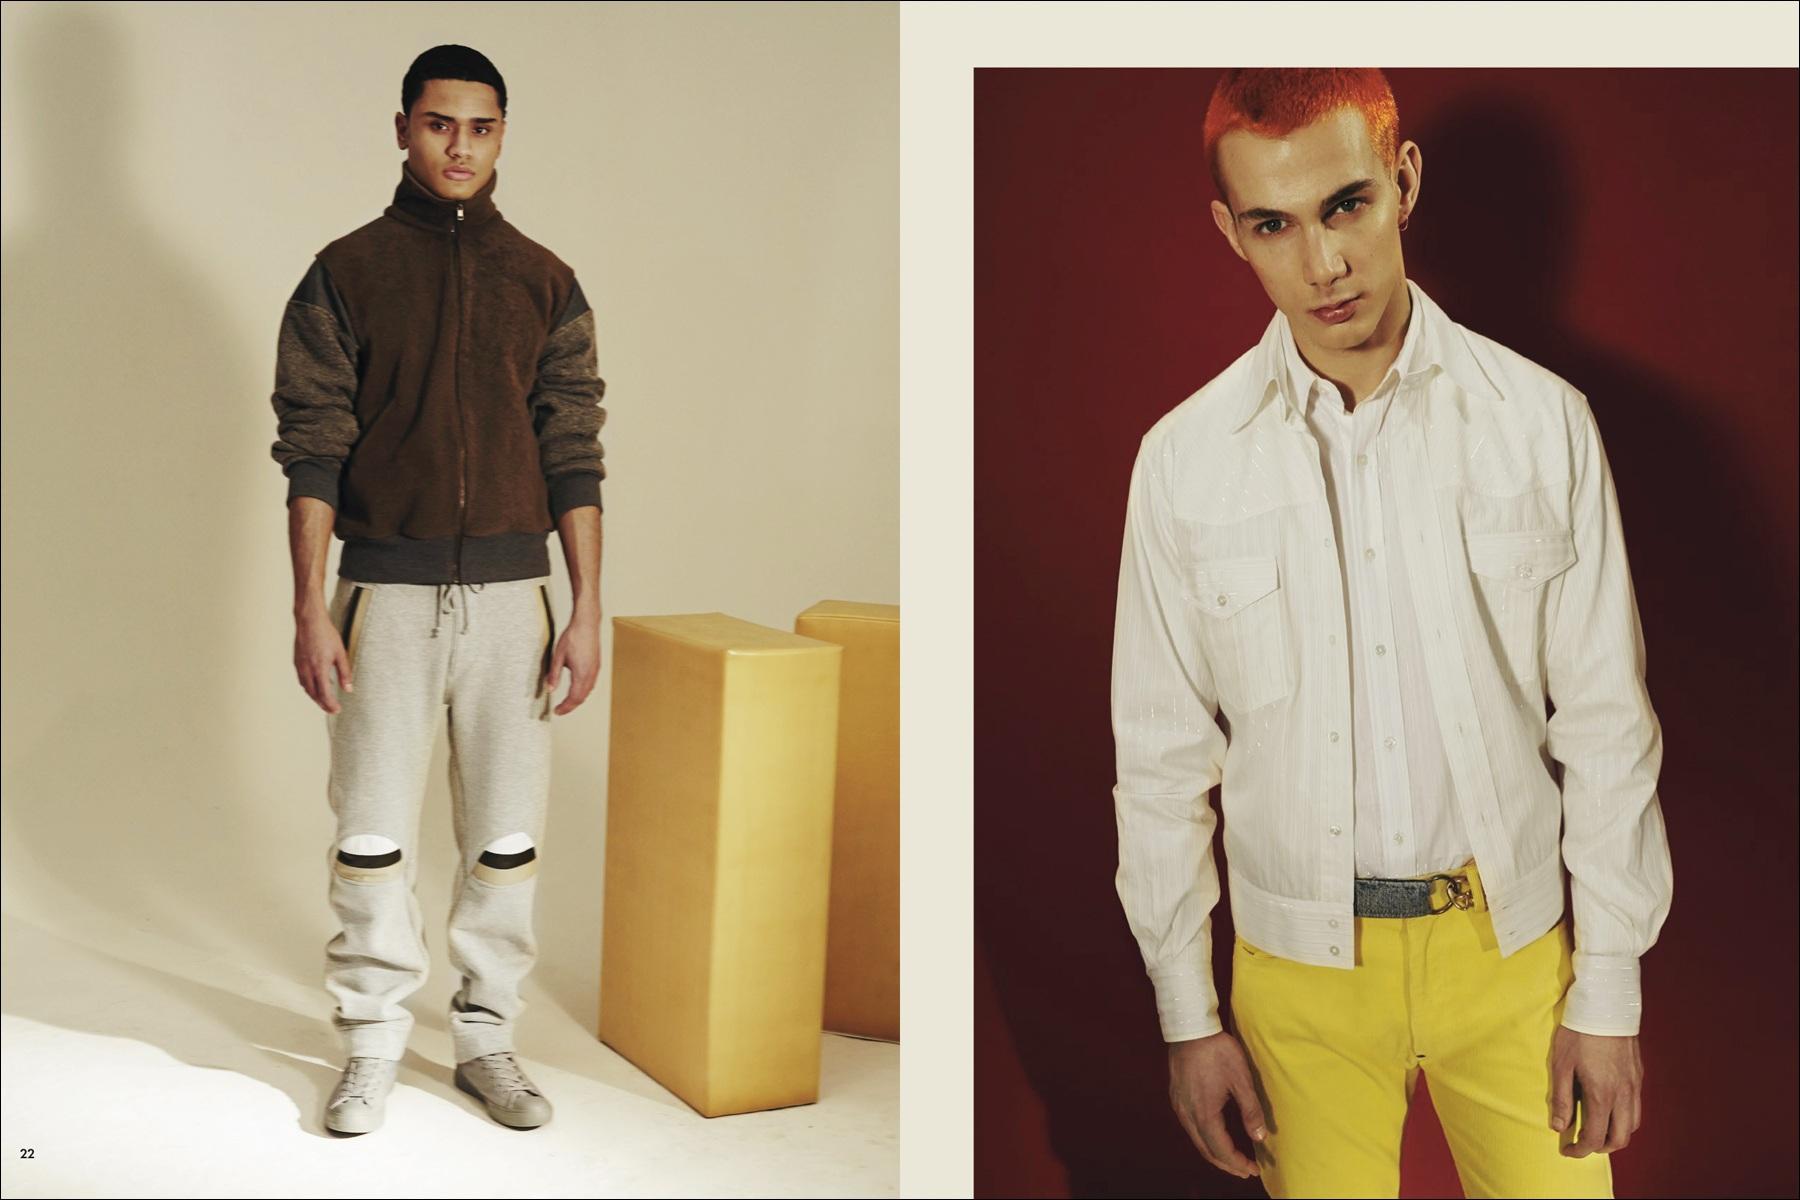 Models Dante Serje and Jacopo Olmo for Martin Keehn F/W16 menswear lookbook. Photography by Simon Cave. Ponyboy magazine NY.